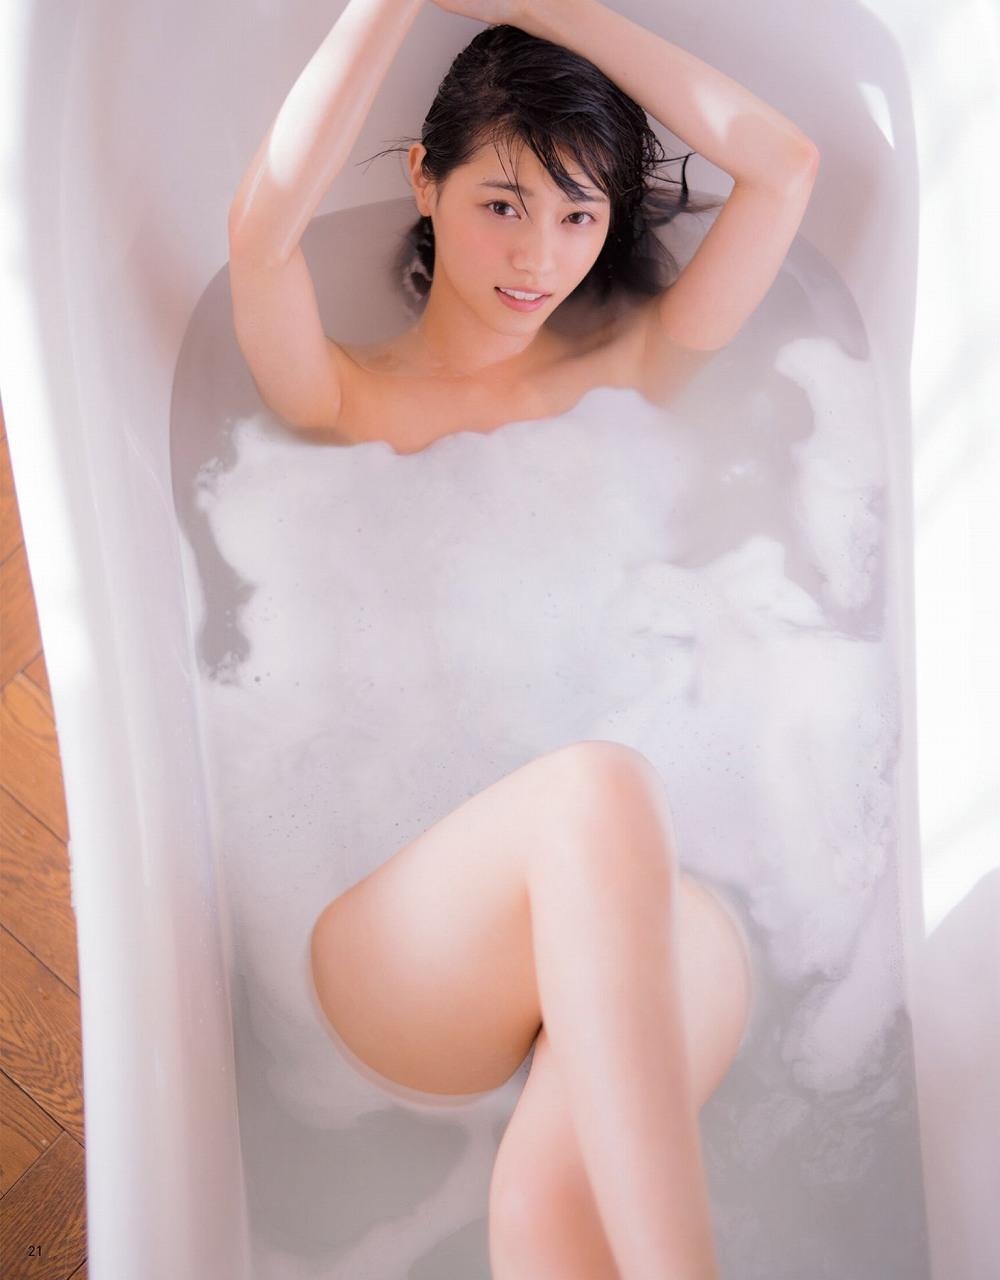 「anan (アンアン) 2017年 2月1日号」西野七瀬の全裸入浴グラビア